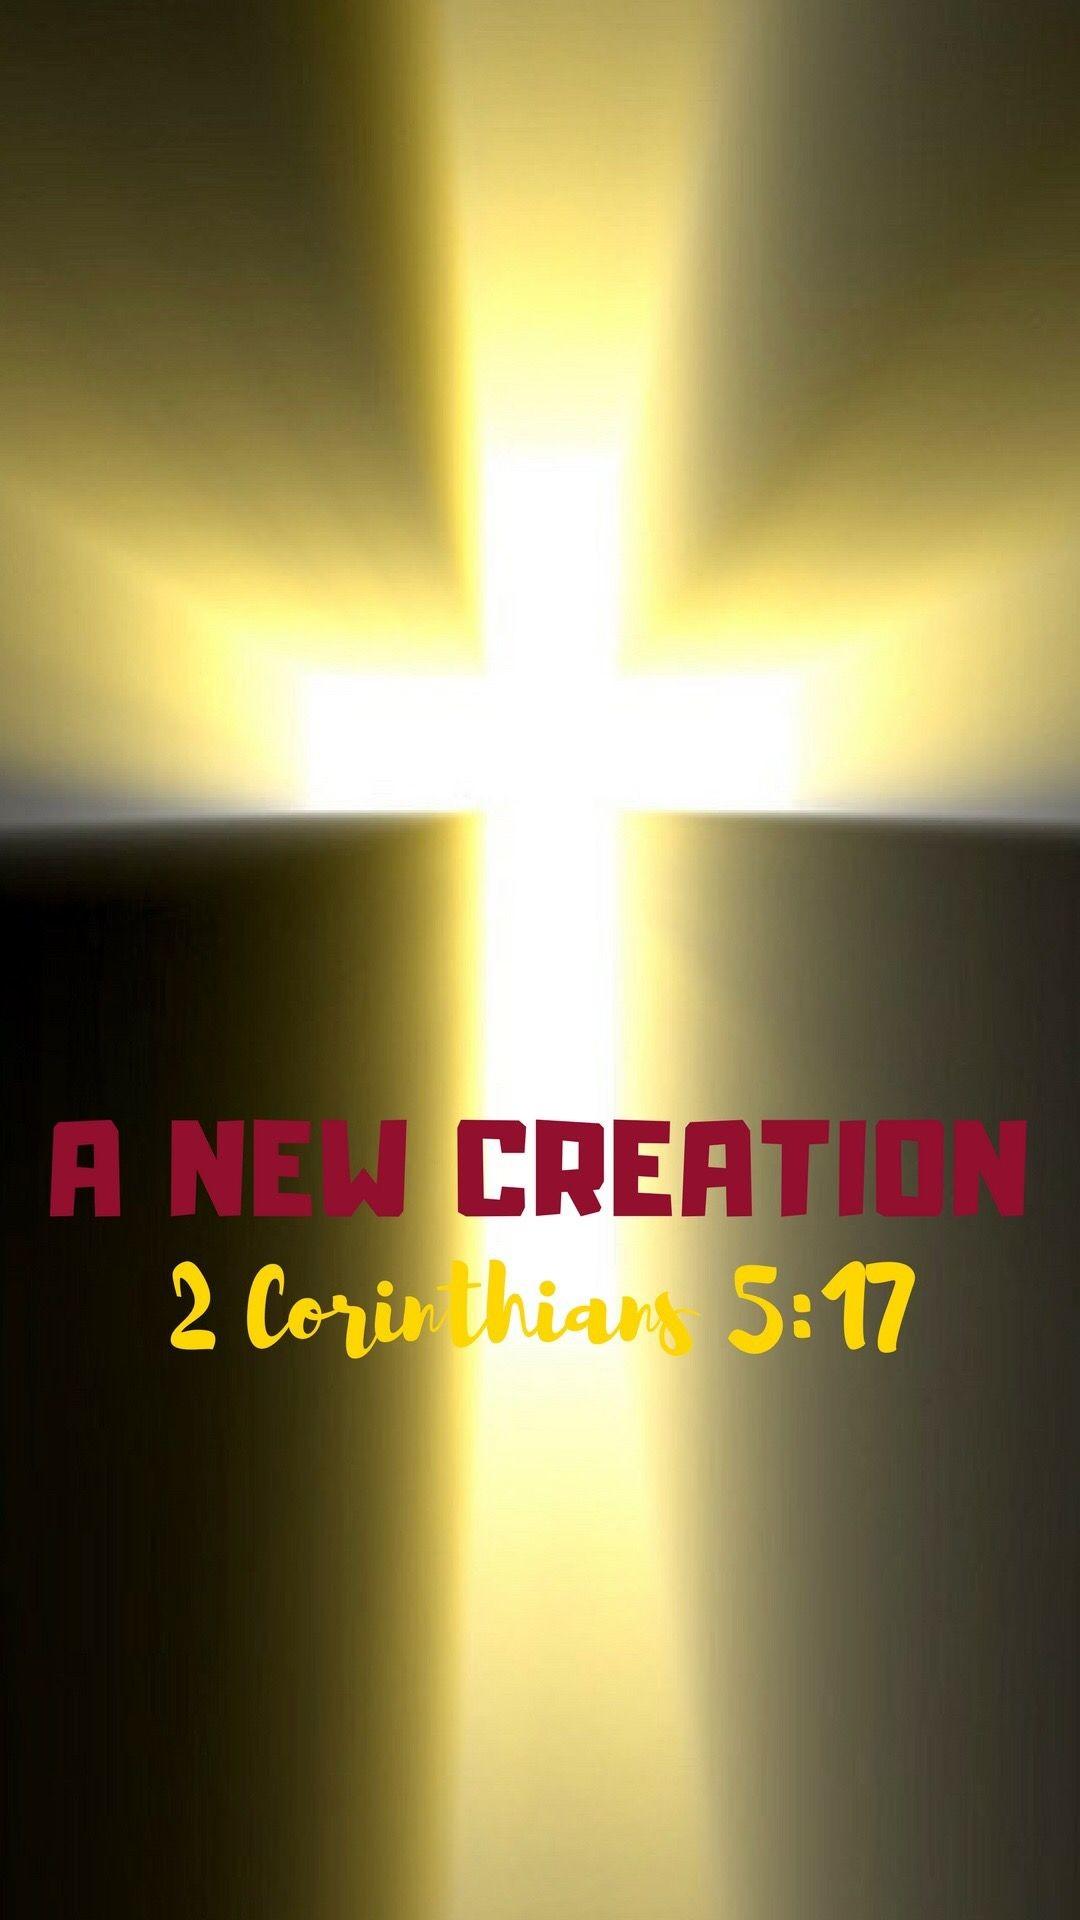 Res: 1080x1920, The Cross of Christ/© Christian Cross Wallpapers #SacredArtandImages